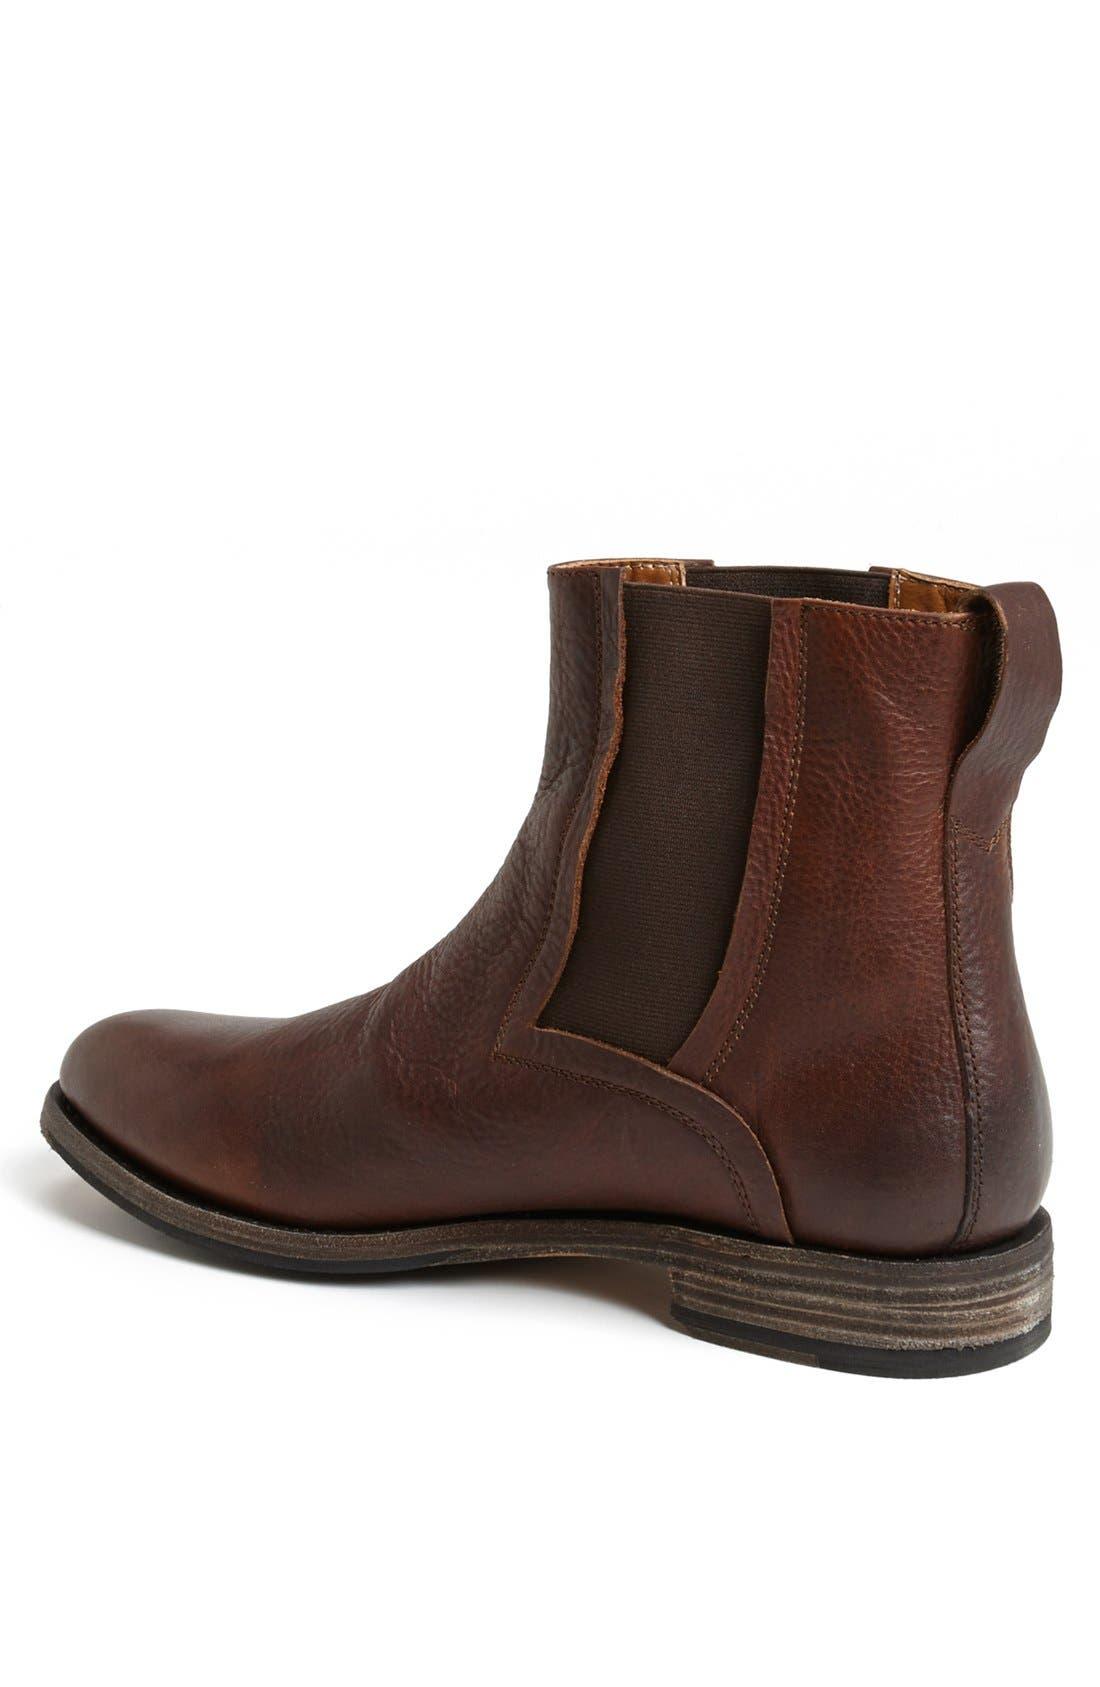 Alternate Image 2  - Blackstone 'GM 21' Chelsea Boot (Men)